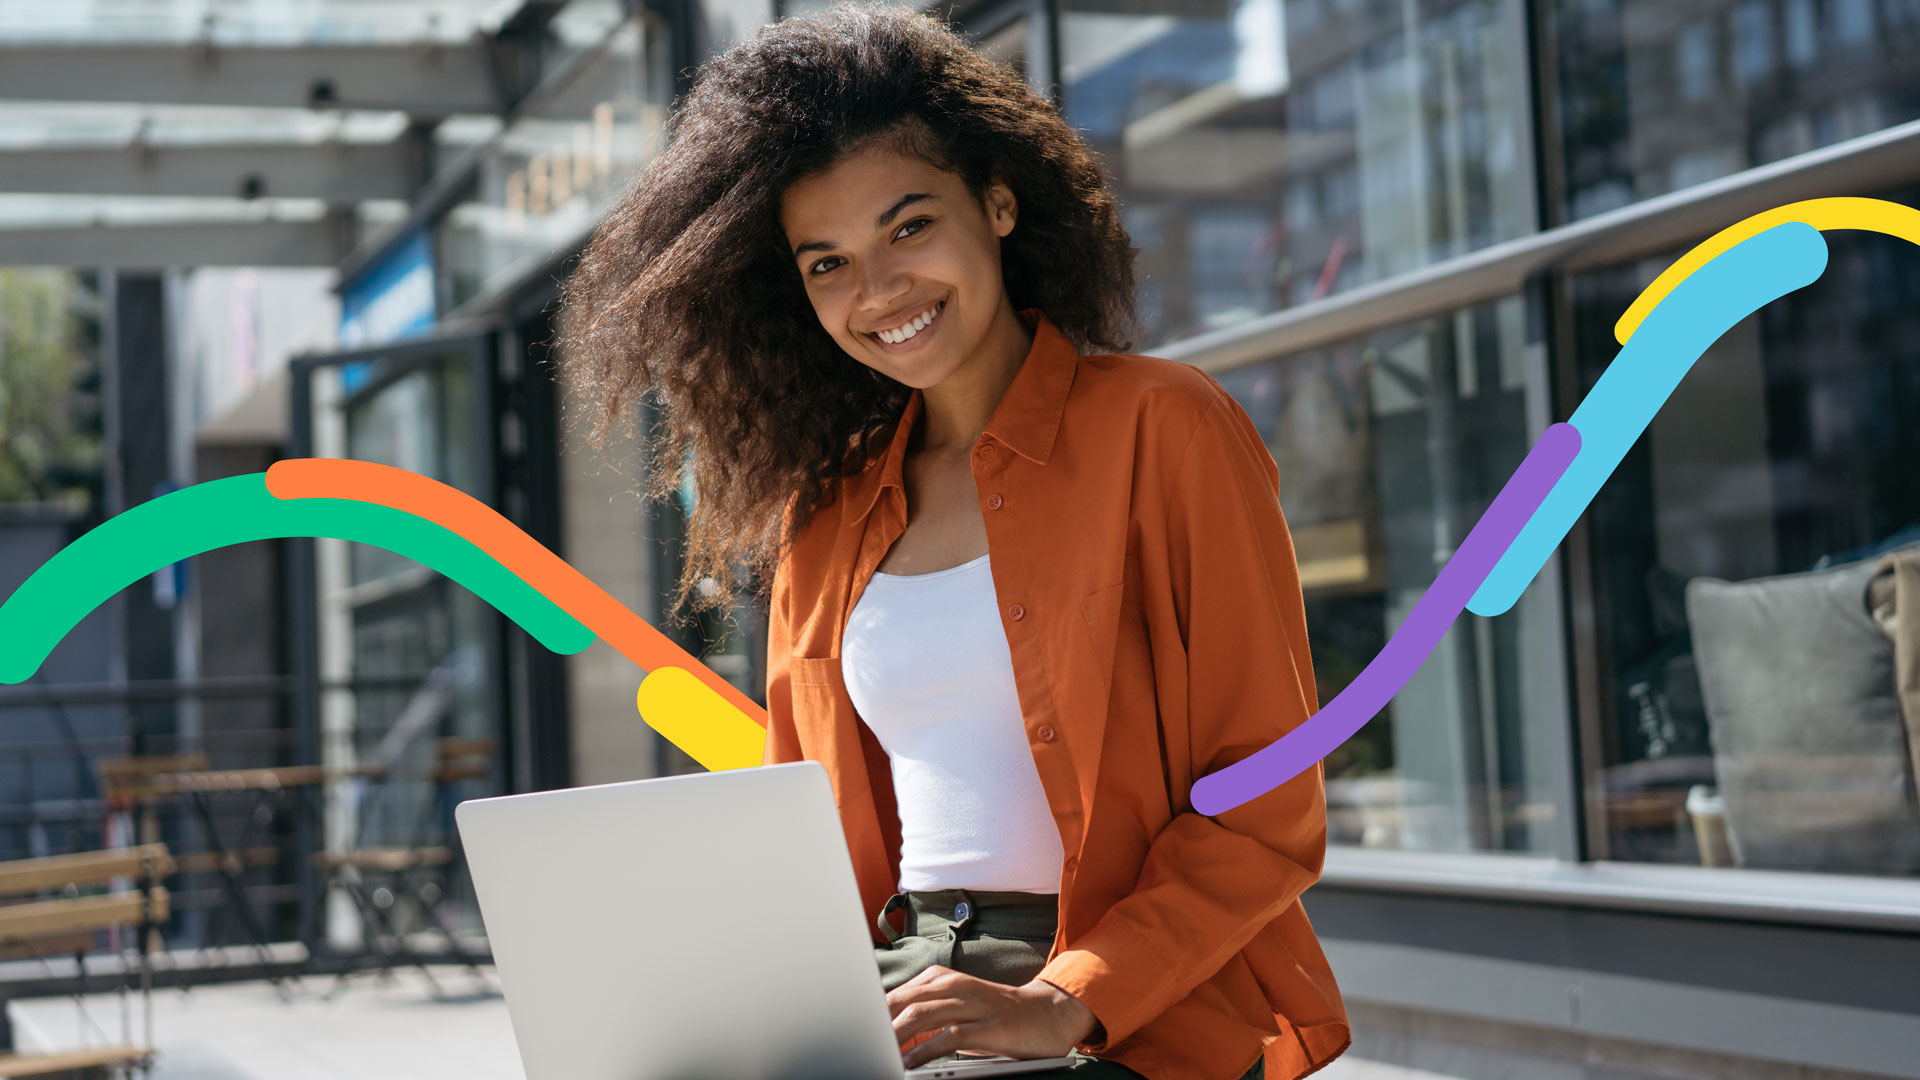 clickbait - Cómo usar el clickbait - marketing digital